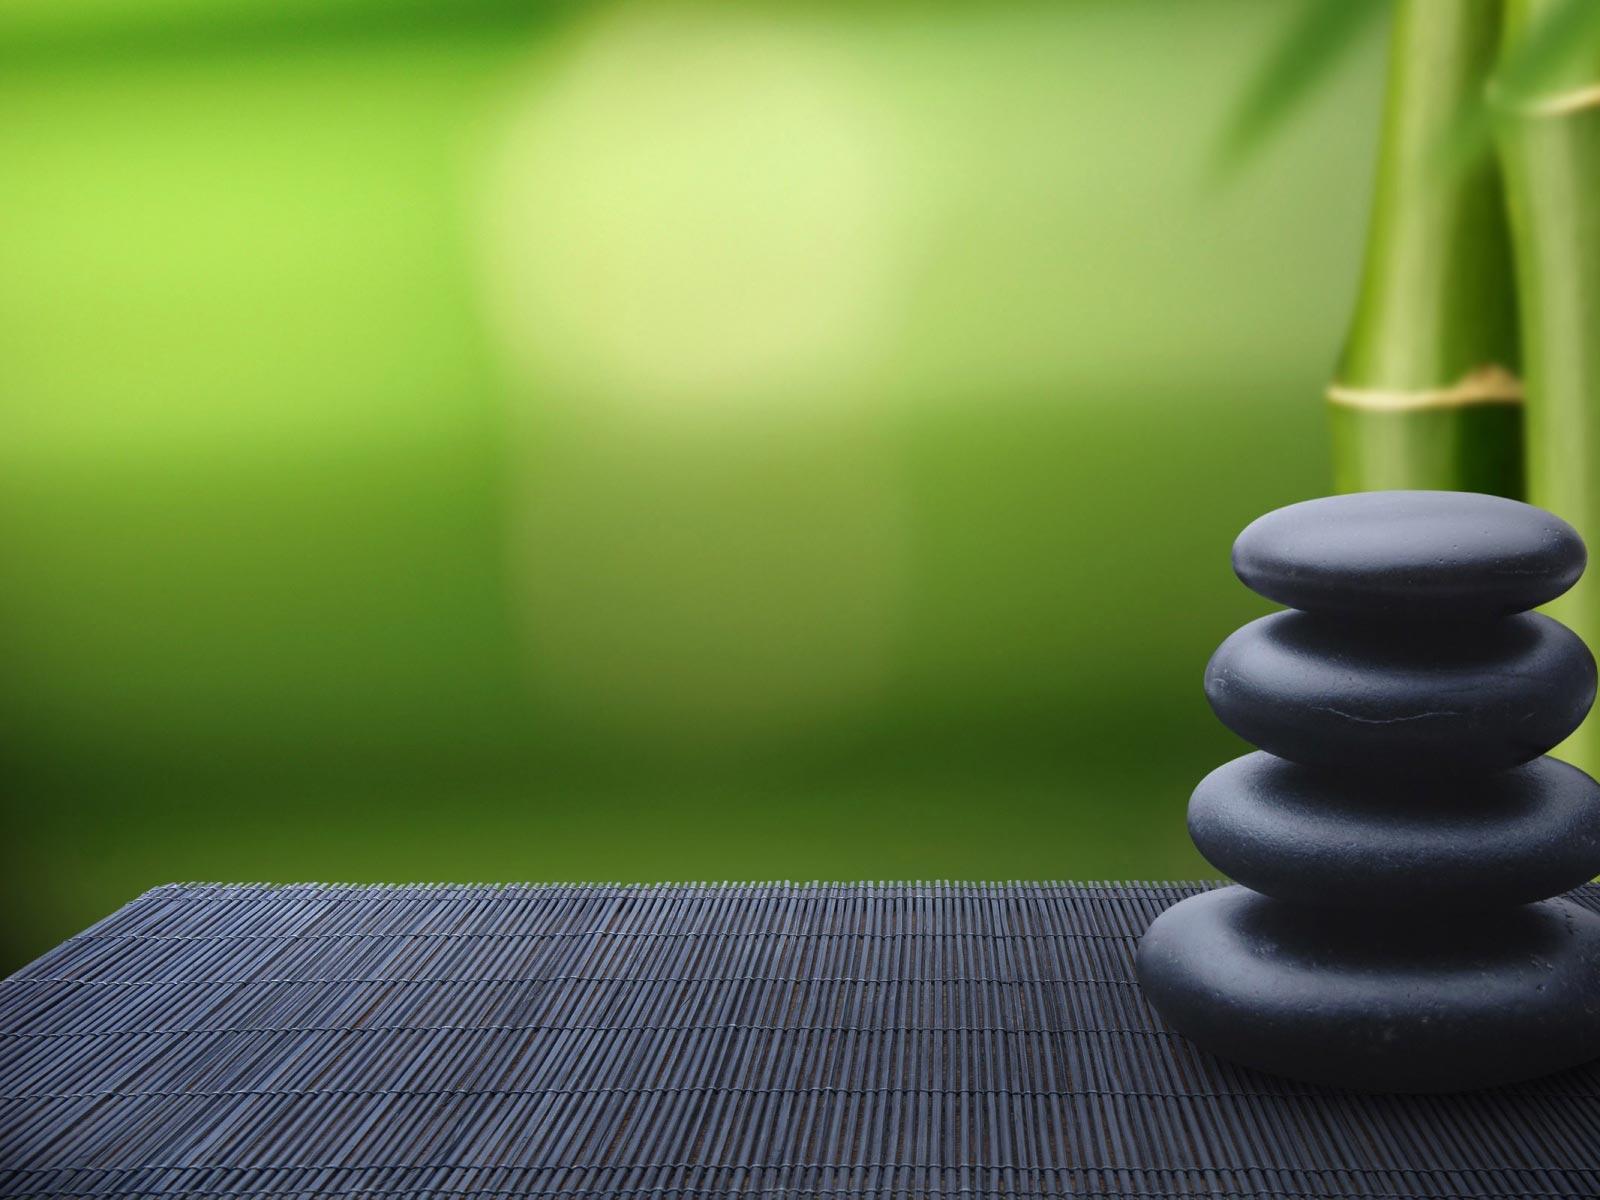 Zen Meditation Wallpaper Wallpapersafari